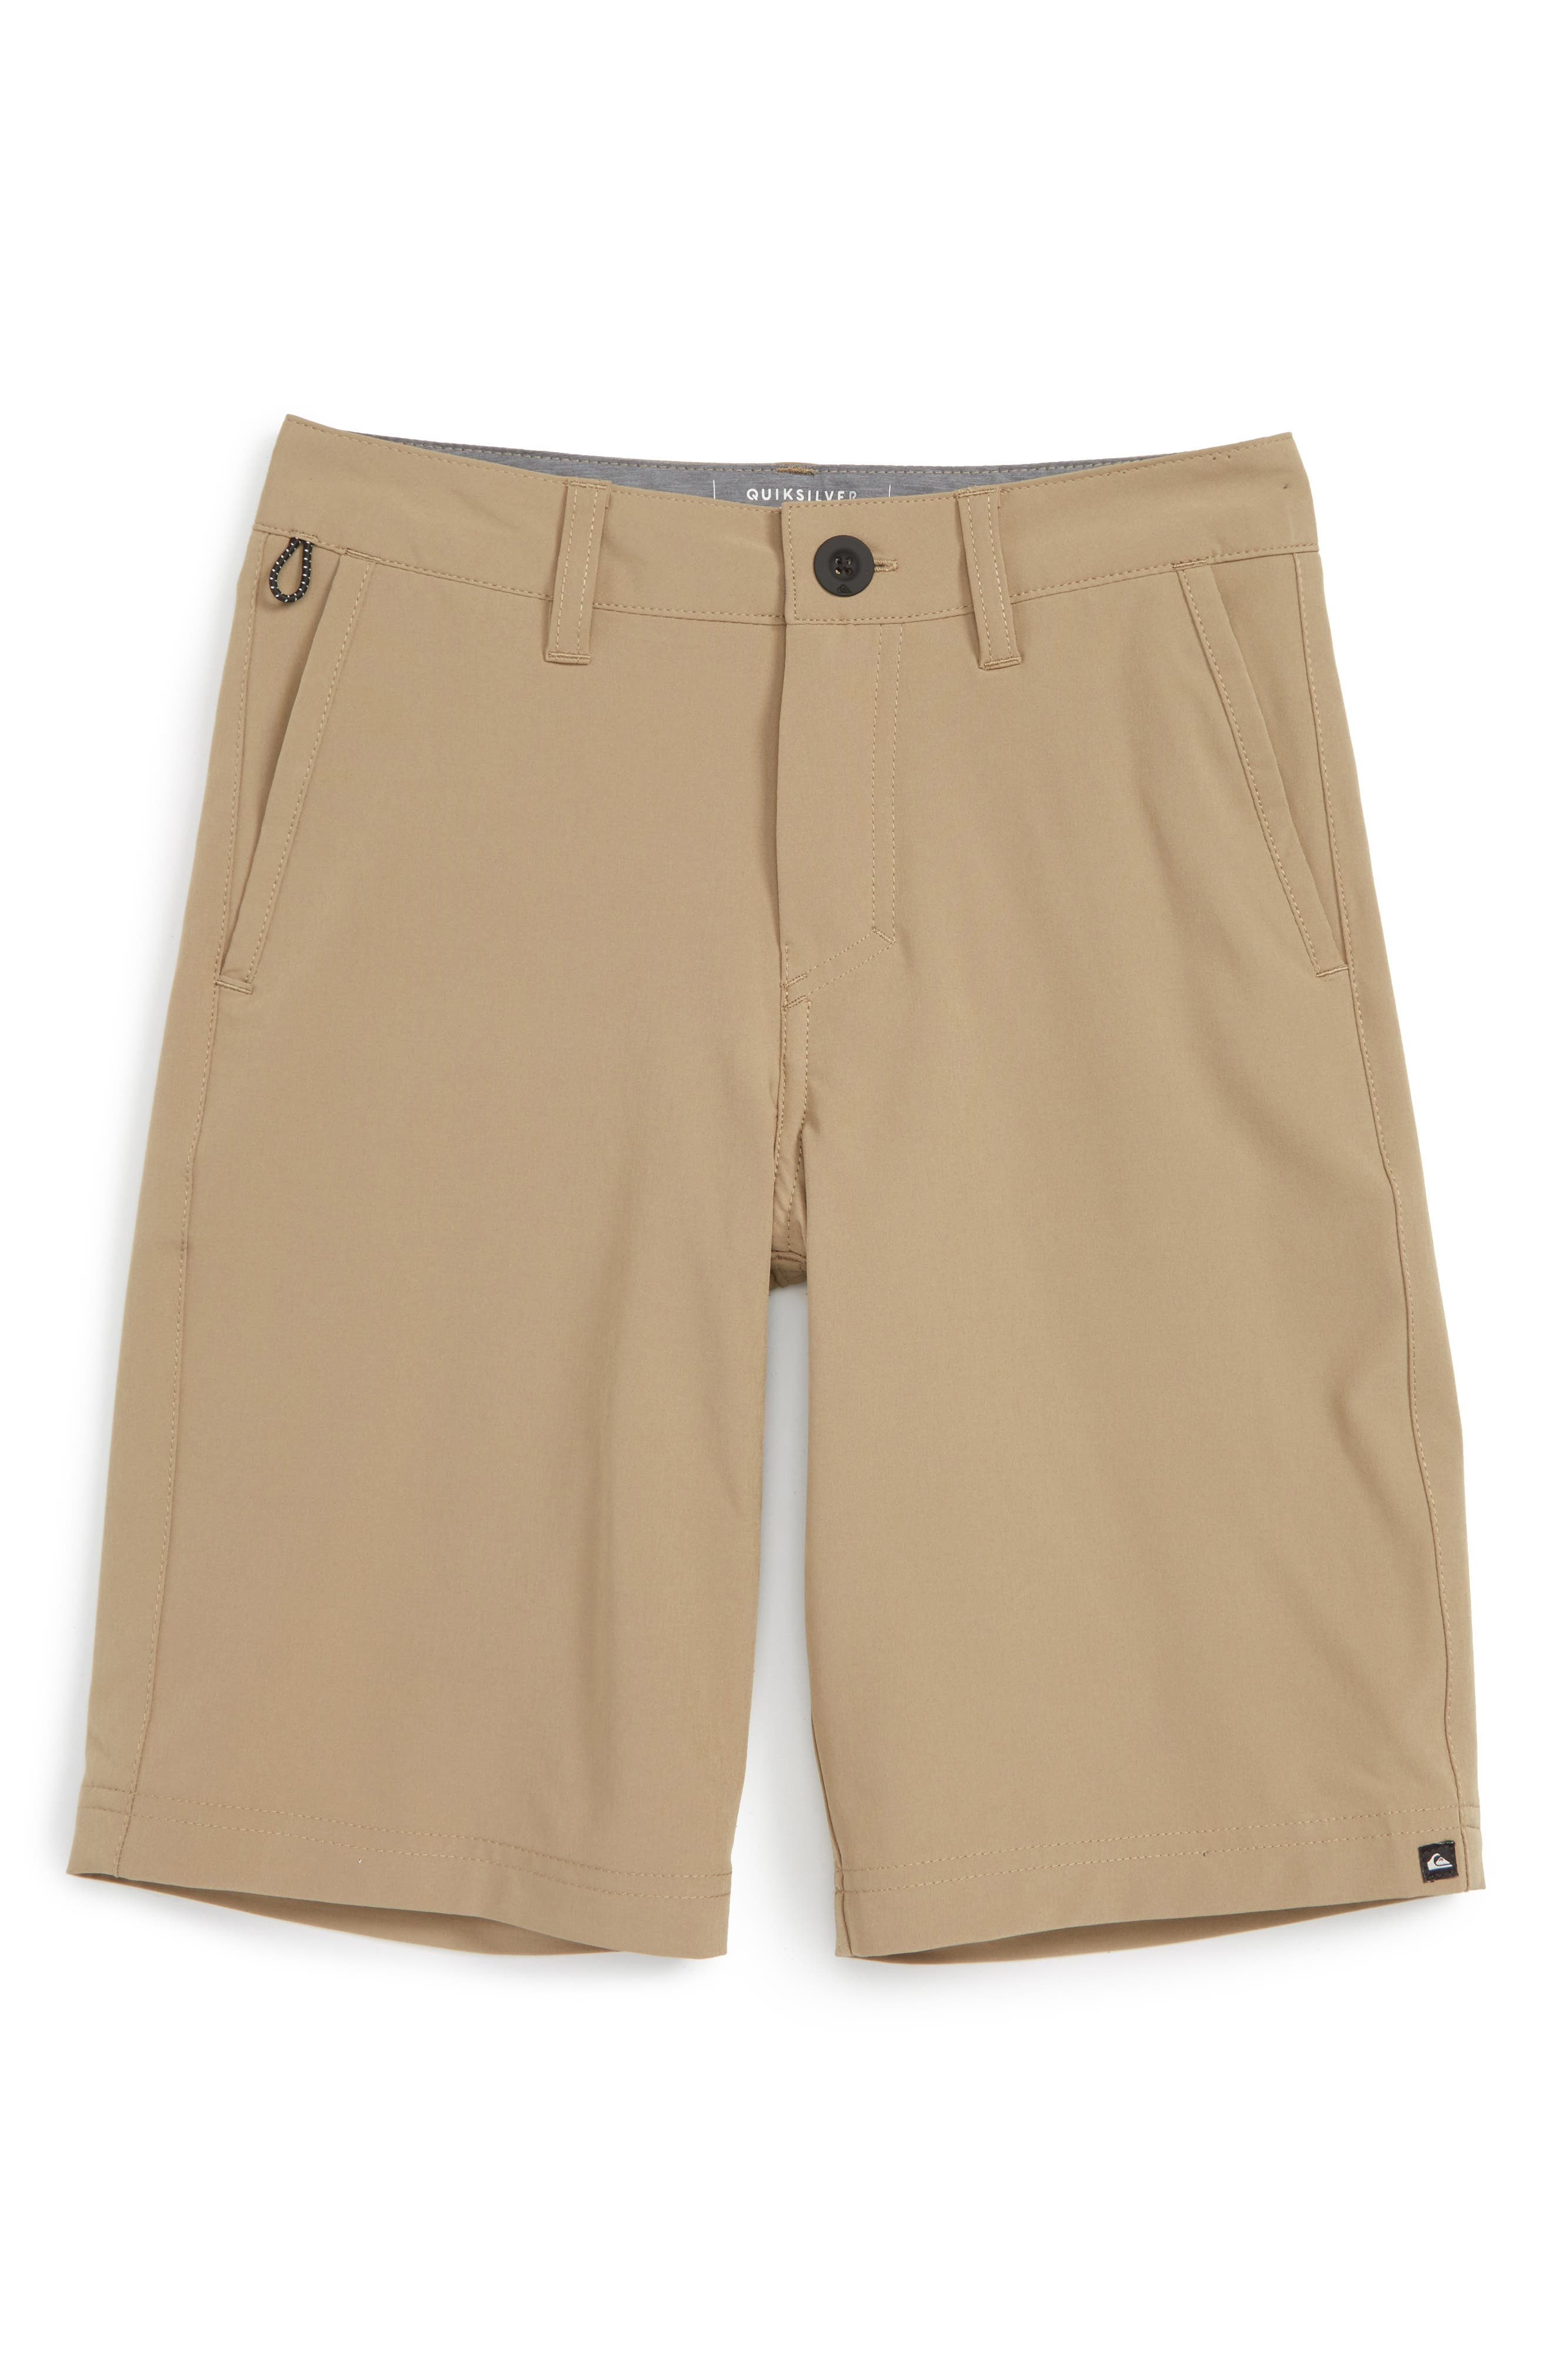 Quiksilver Solid Amphibian Board Shorts (Big Boys)